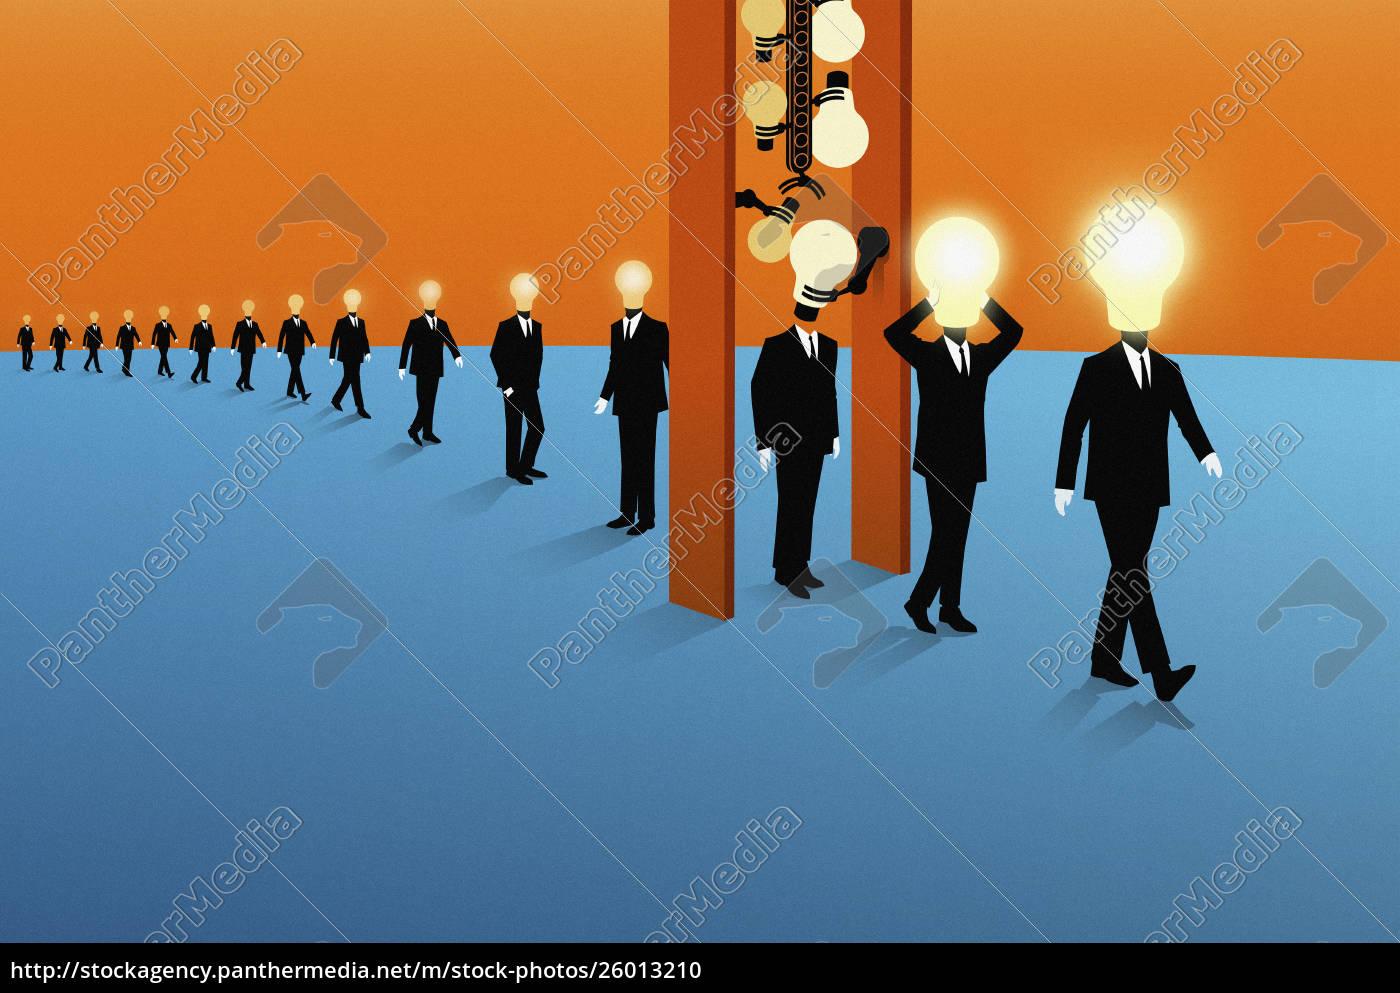 row, of, businessmen, with, dim, light - 26013210